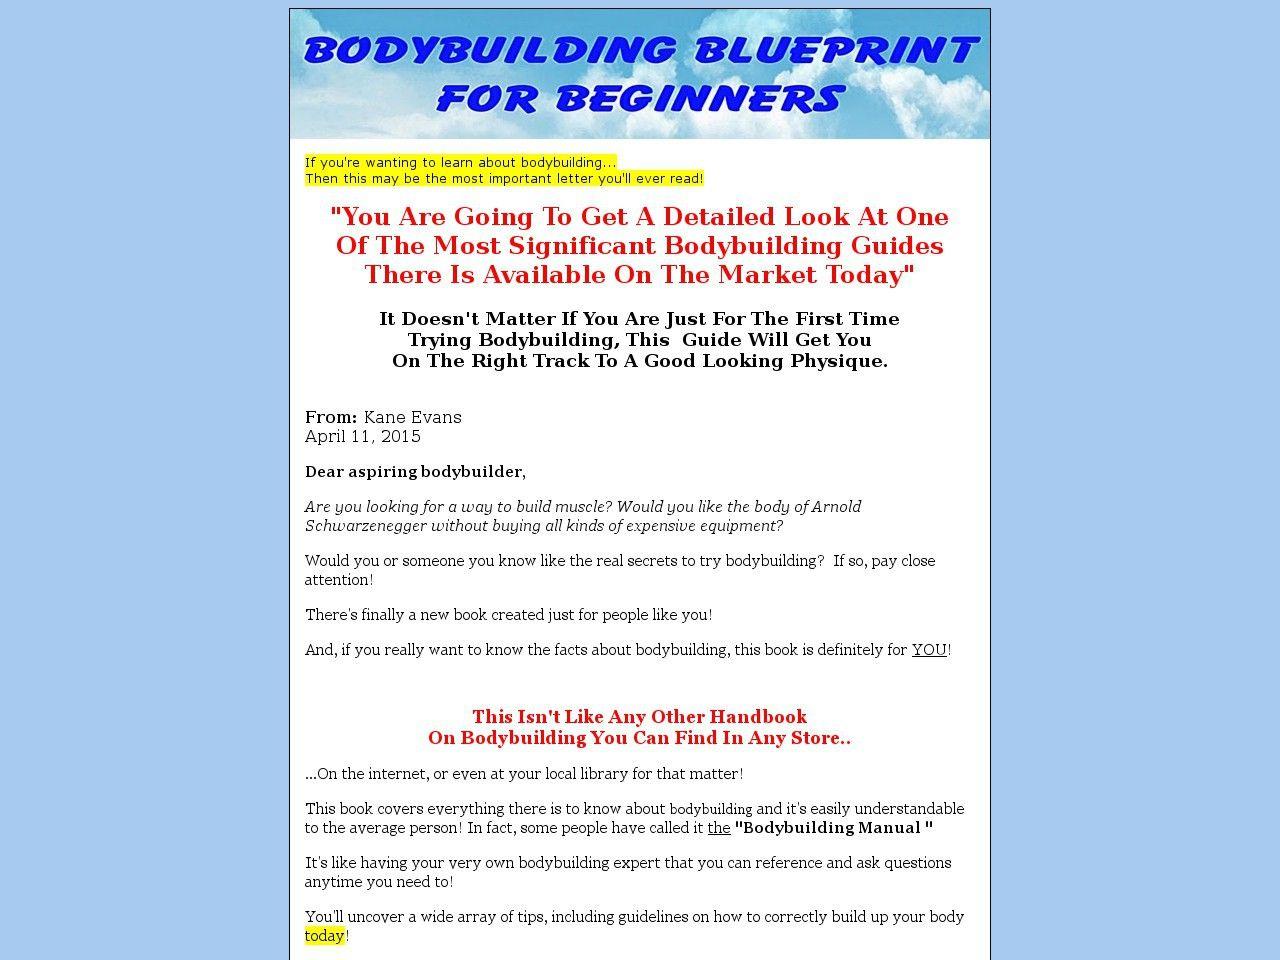 Get bodybuilding blueprint for beginners httpvnulablab get bodybuilding blueprint for beginners httpvnulab malvernweather Images